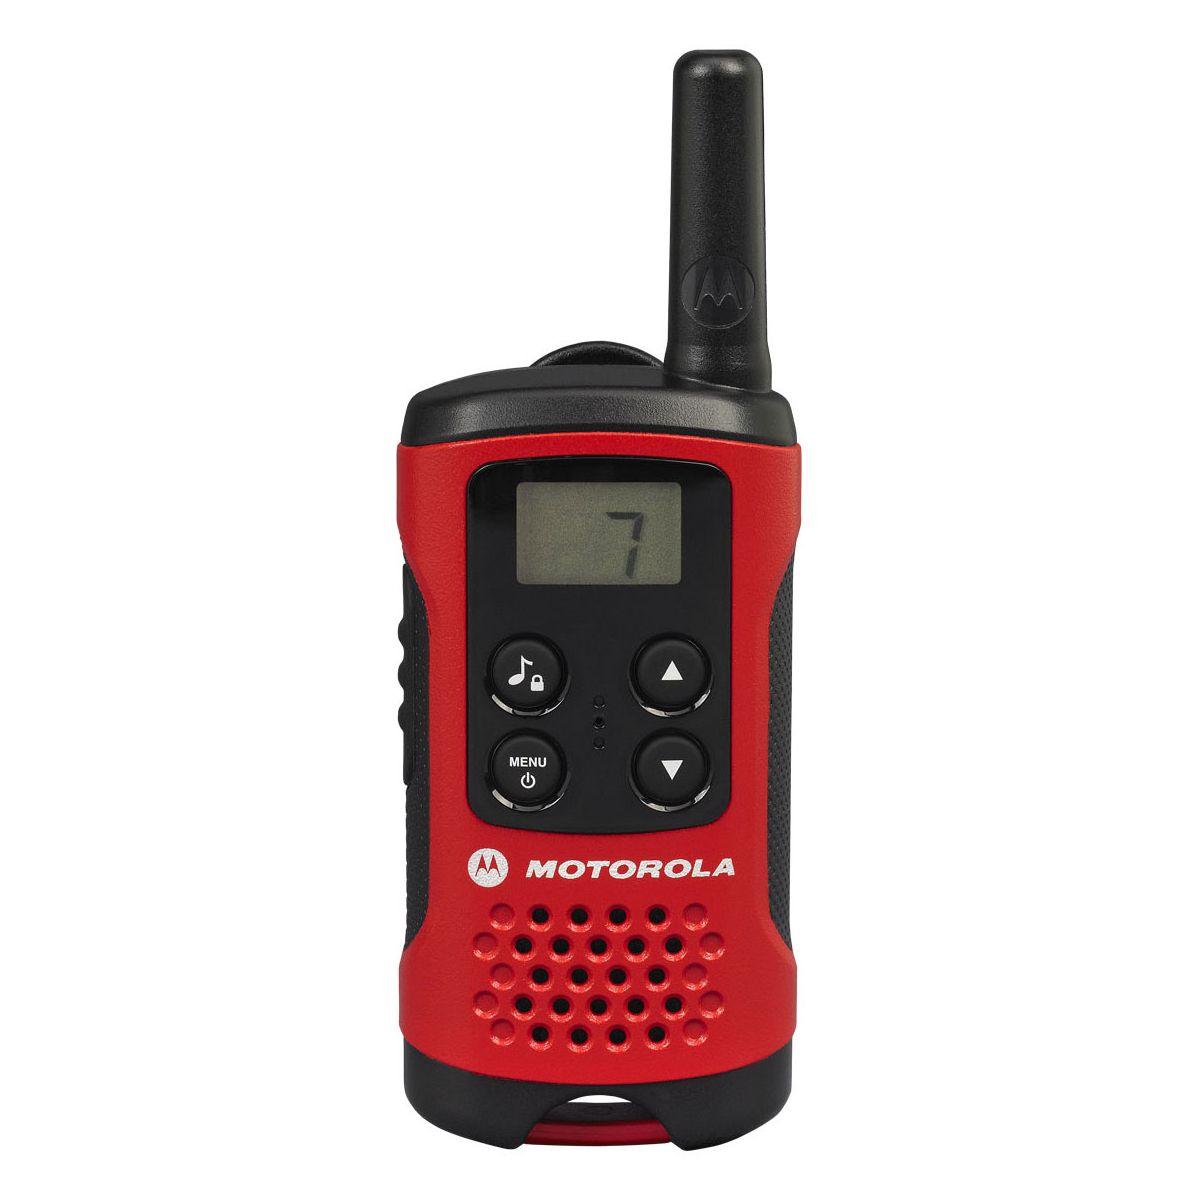 Talkie walkie motorola t40 (photo)